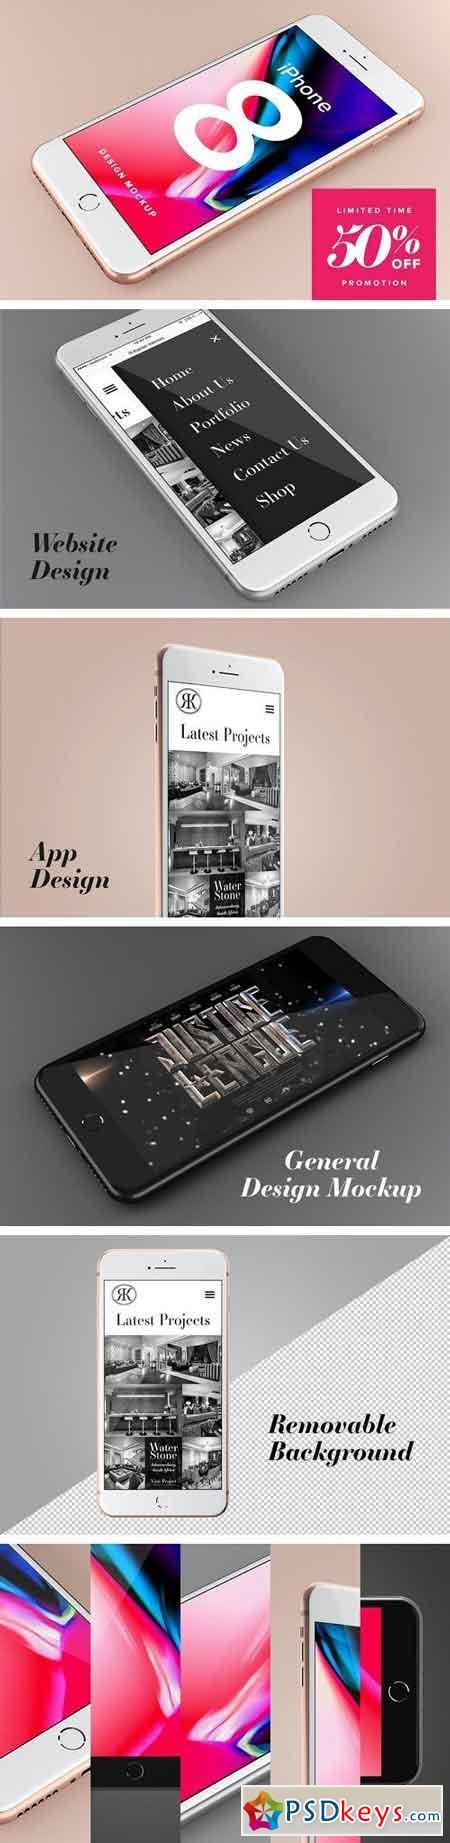 iPhone 8 Design Mockup 1928819